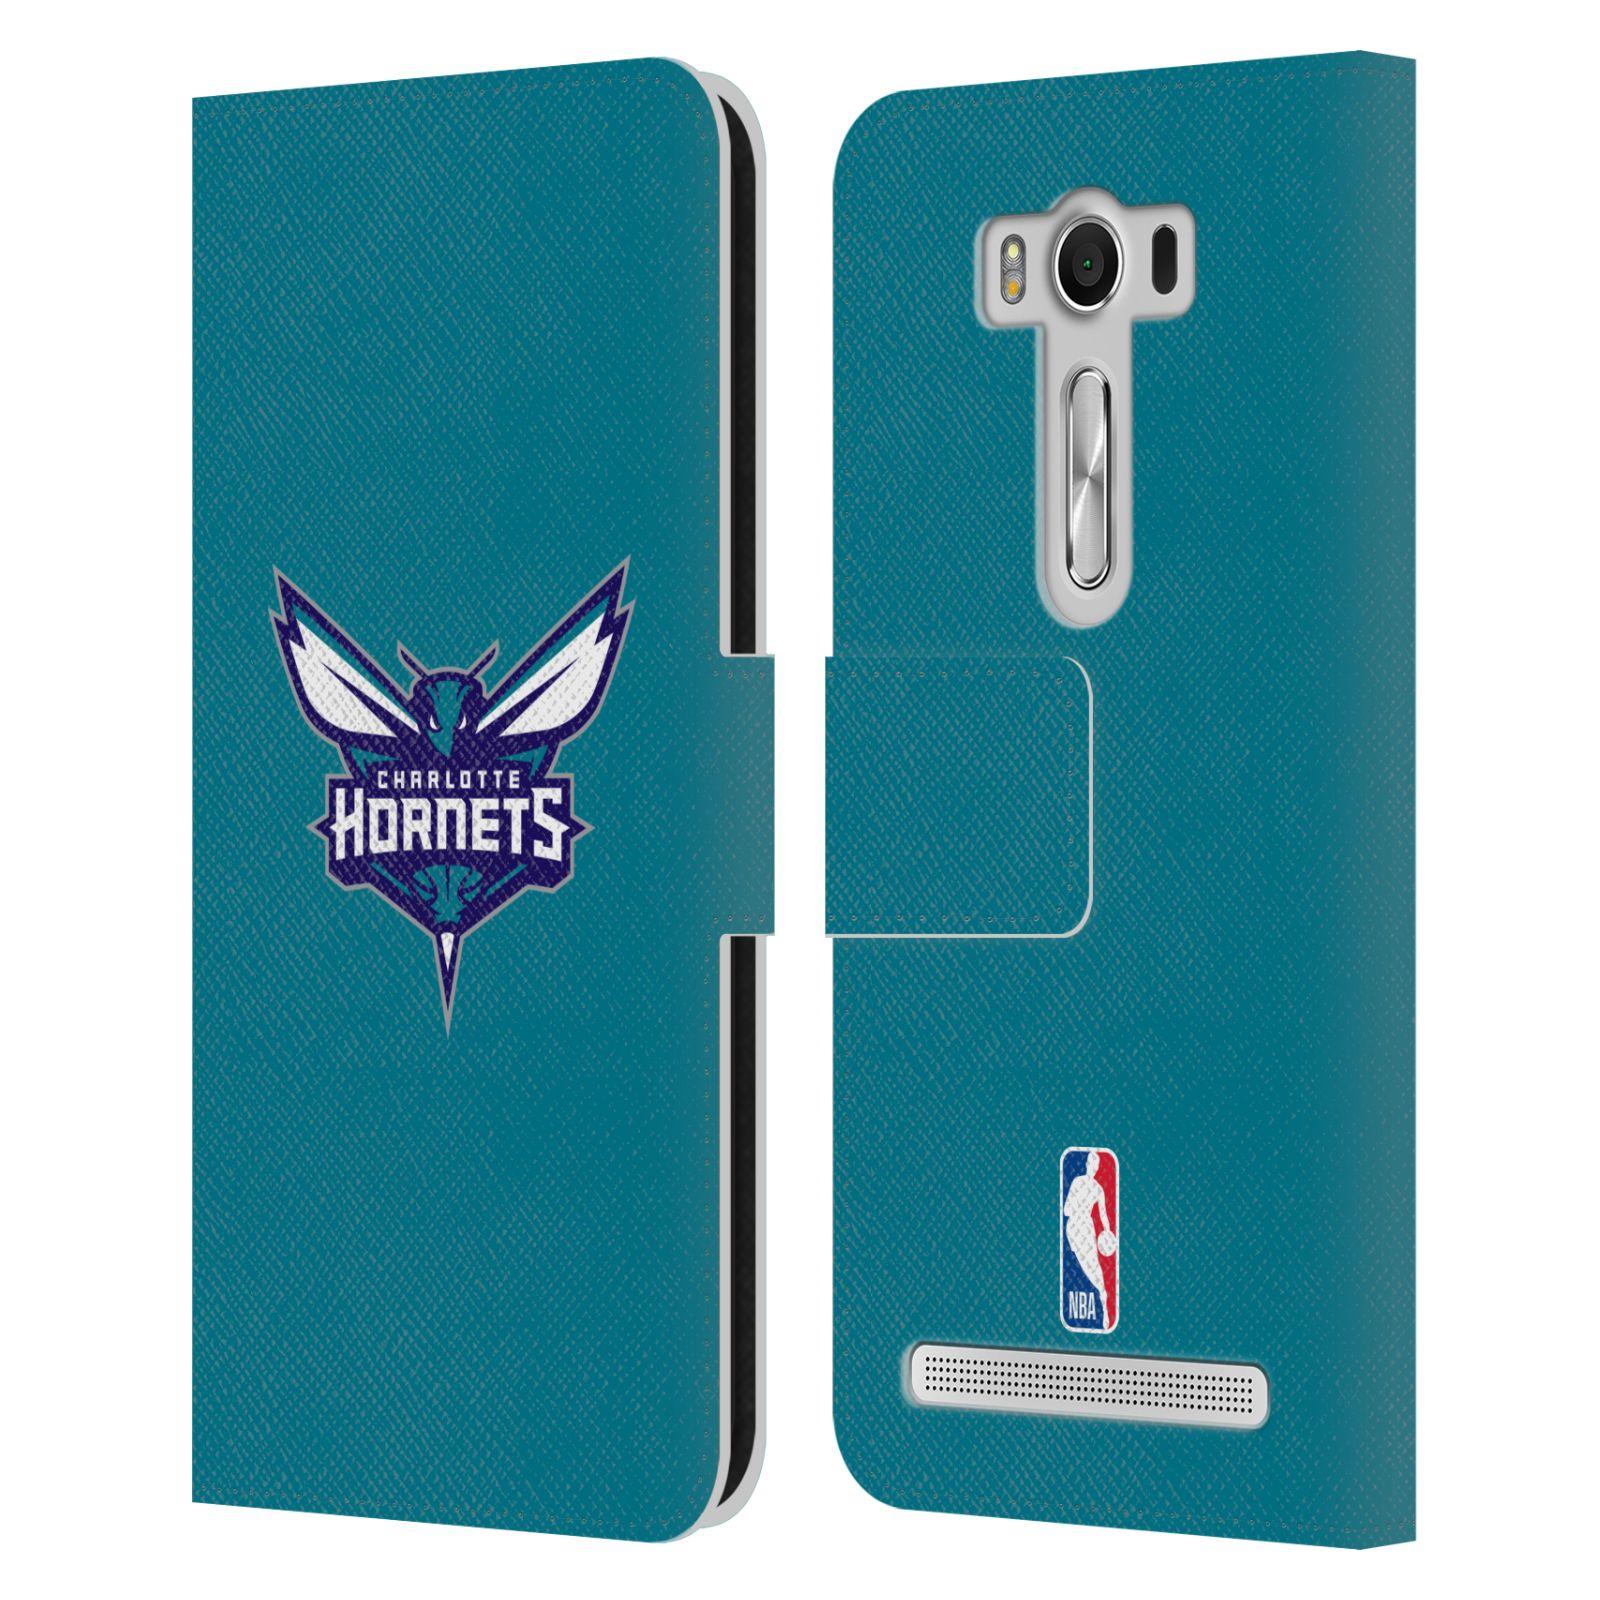 Pouzdro na mobil Asus Zenfone 2 Laser ZE500KL - Head Case -NBA - Charlotte Hornets modrá barva znak